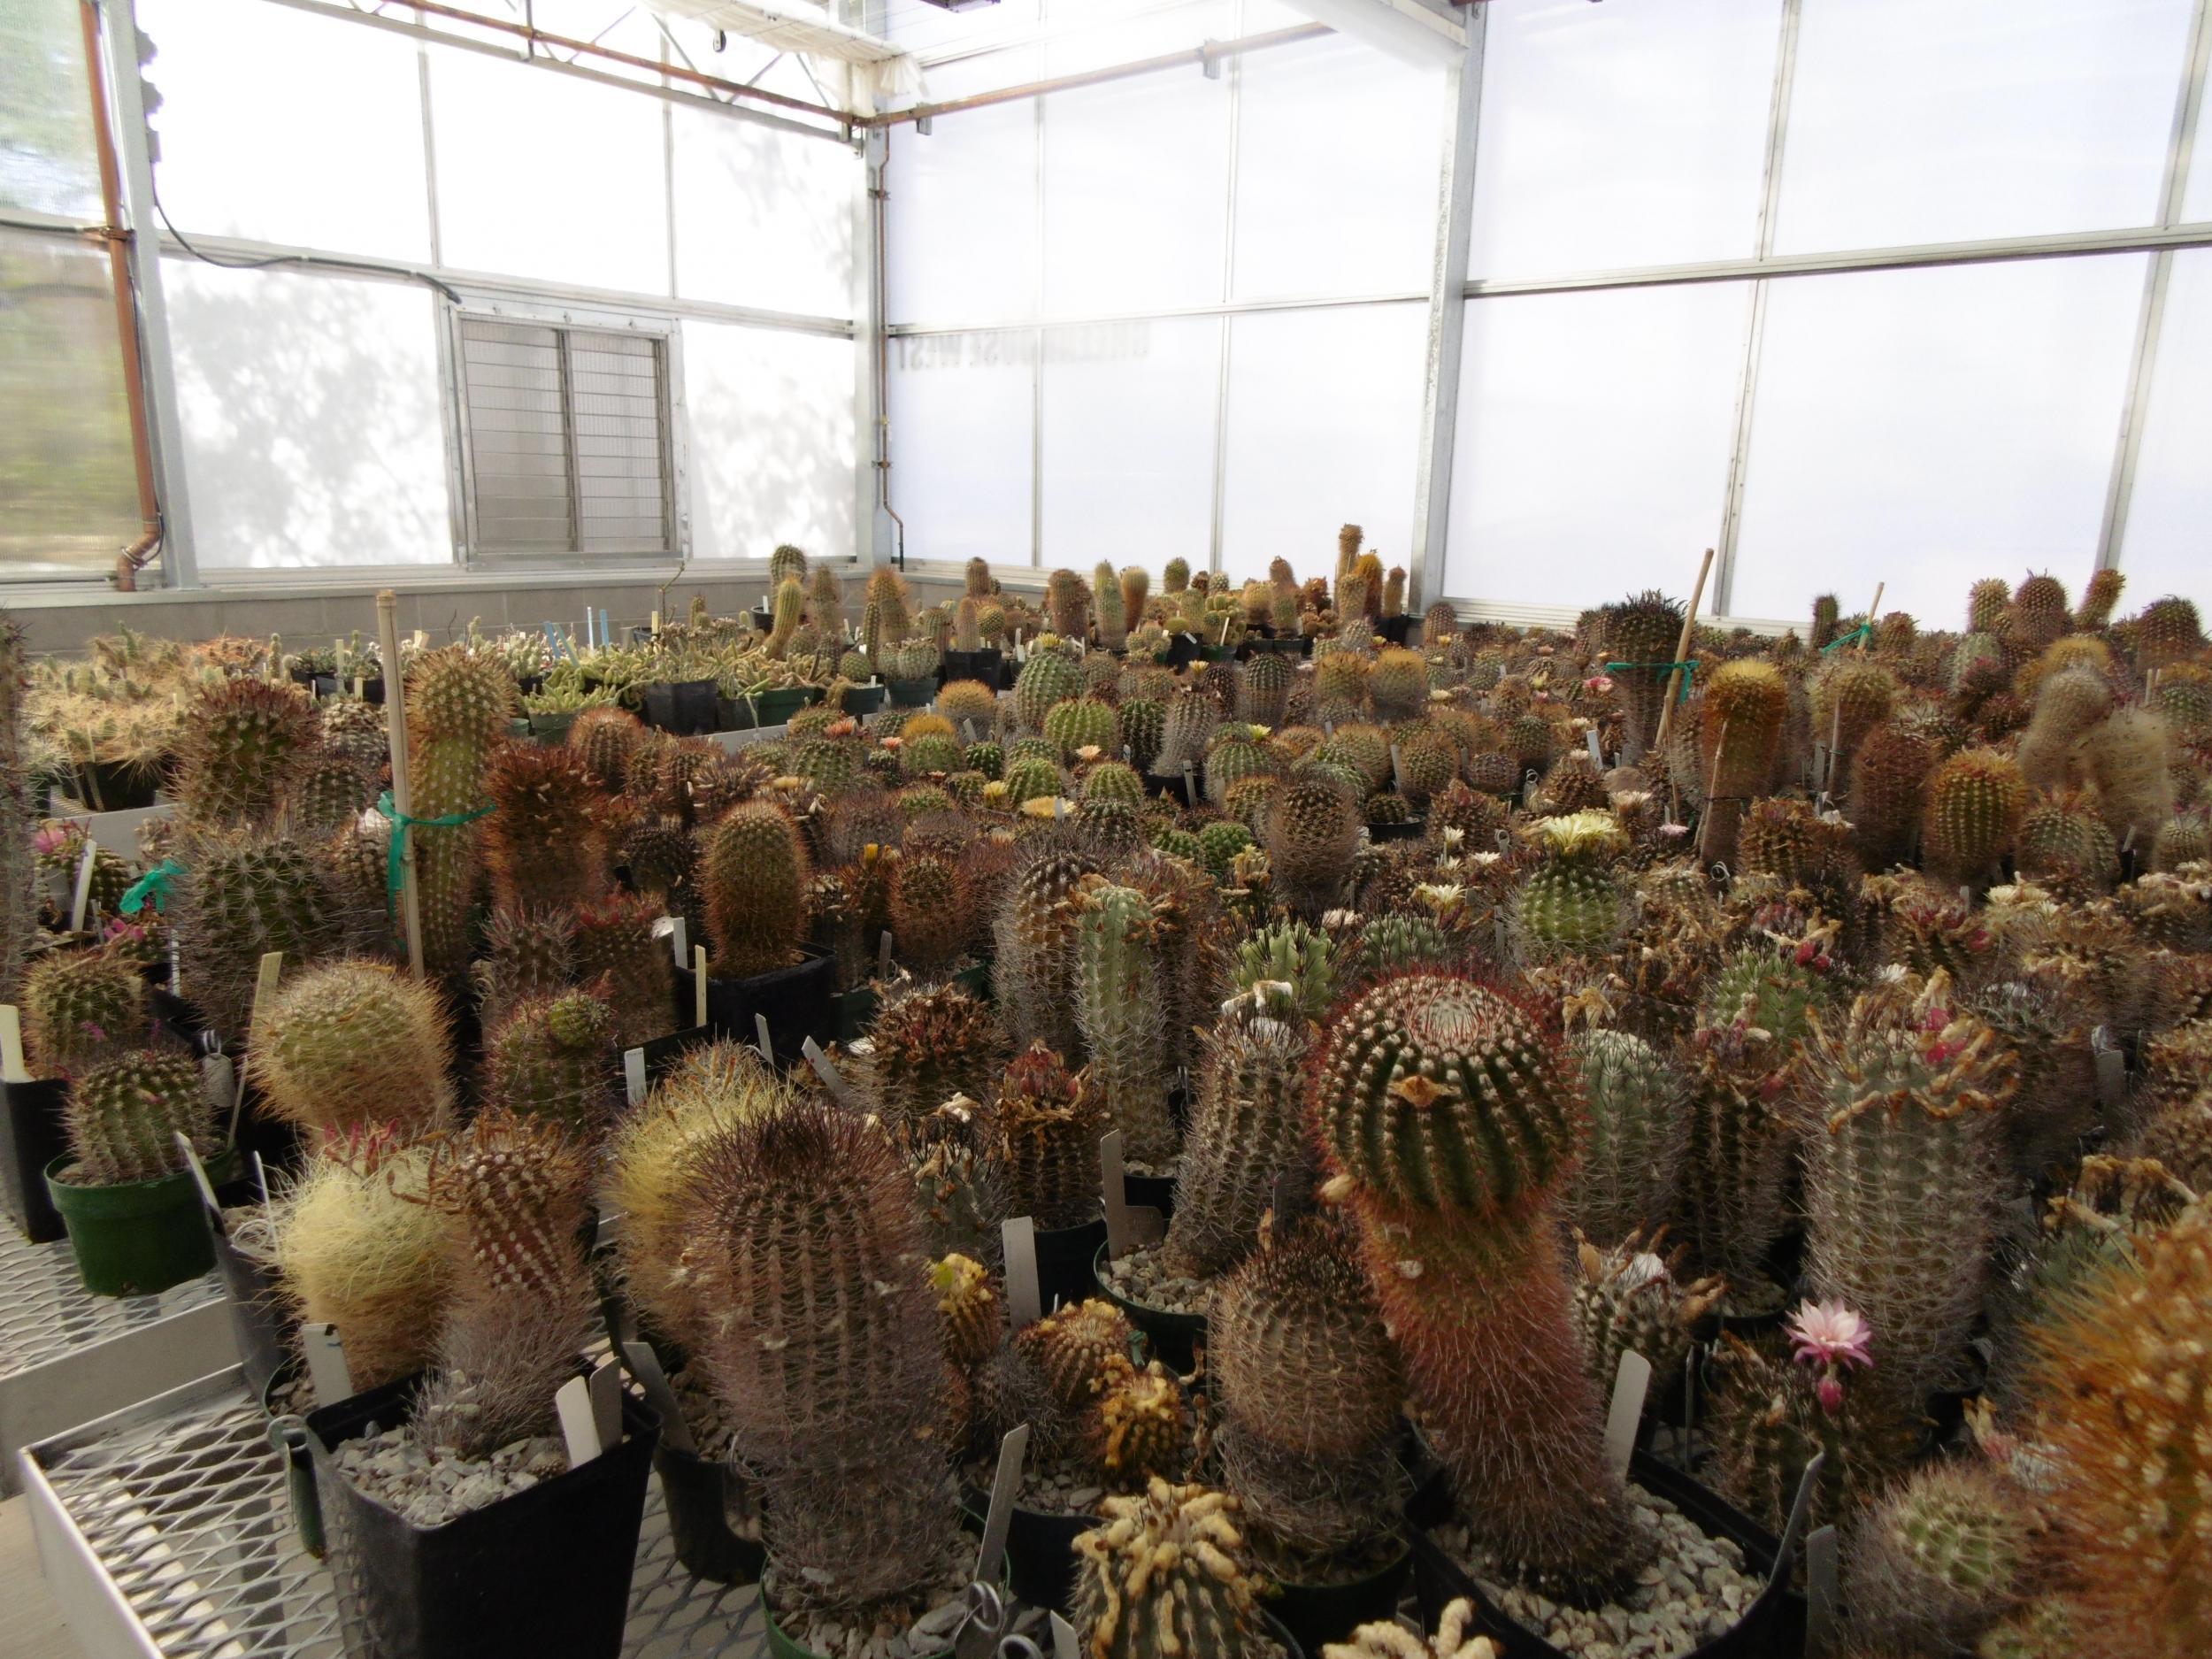 The cactus poachers of Phoenix who are ruining the Arizona desert ...